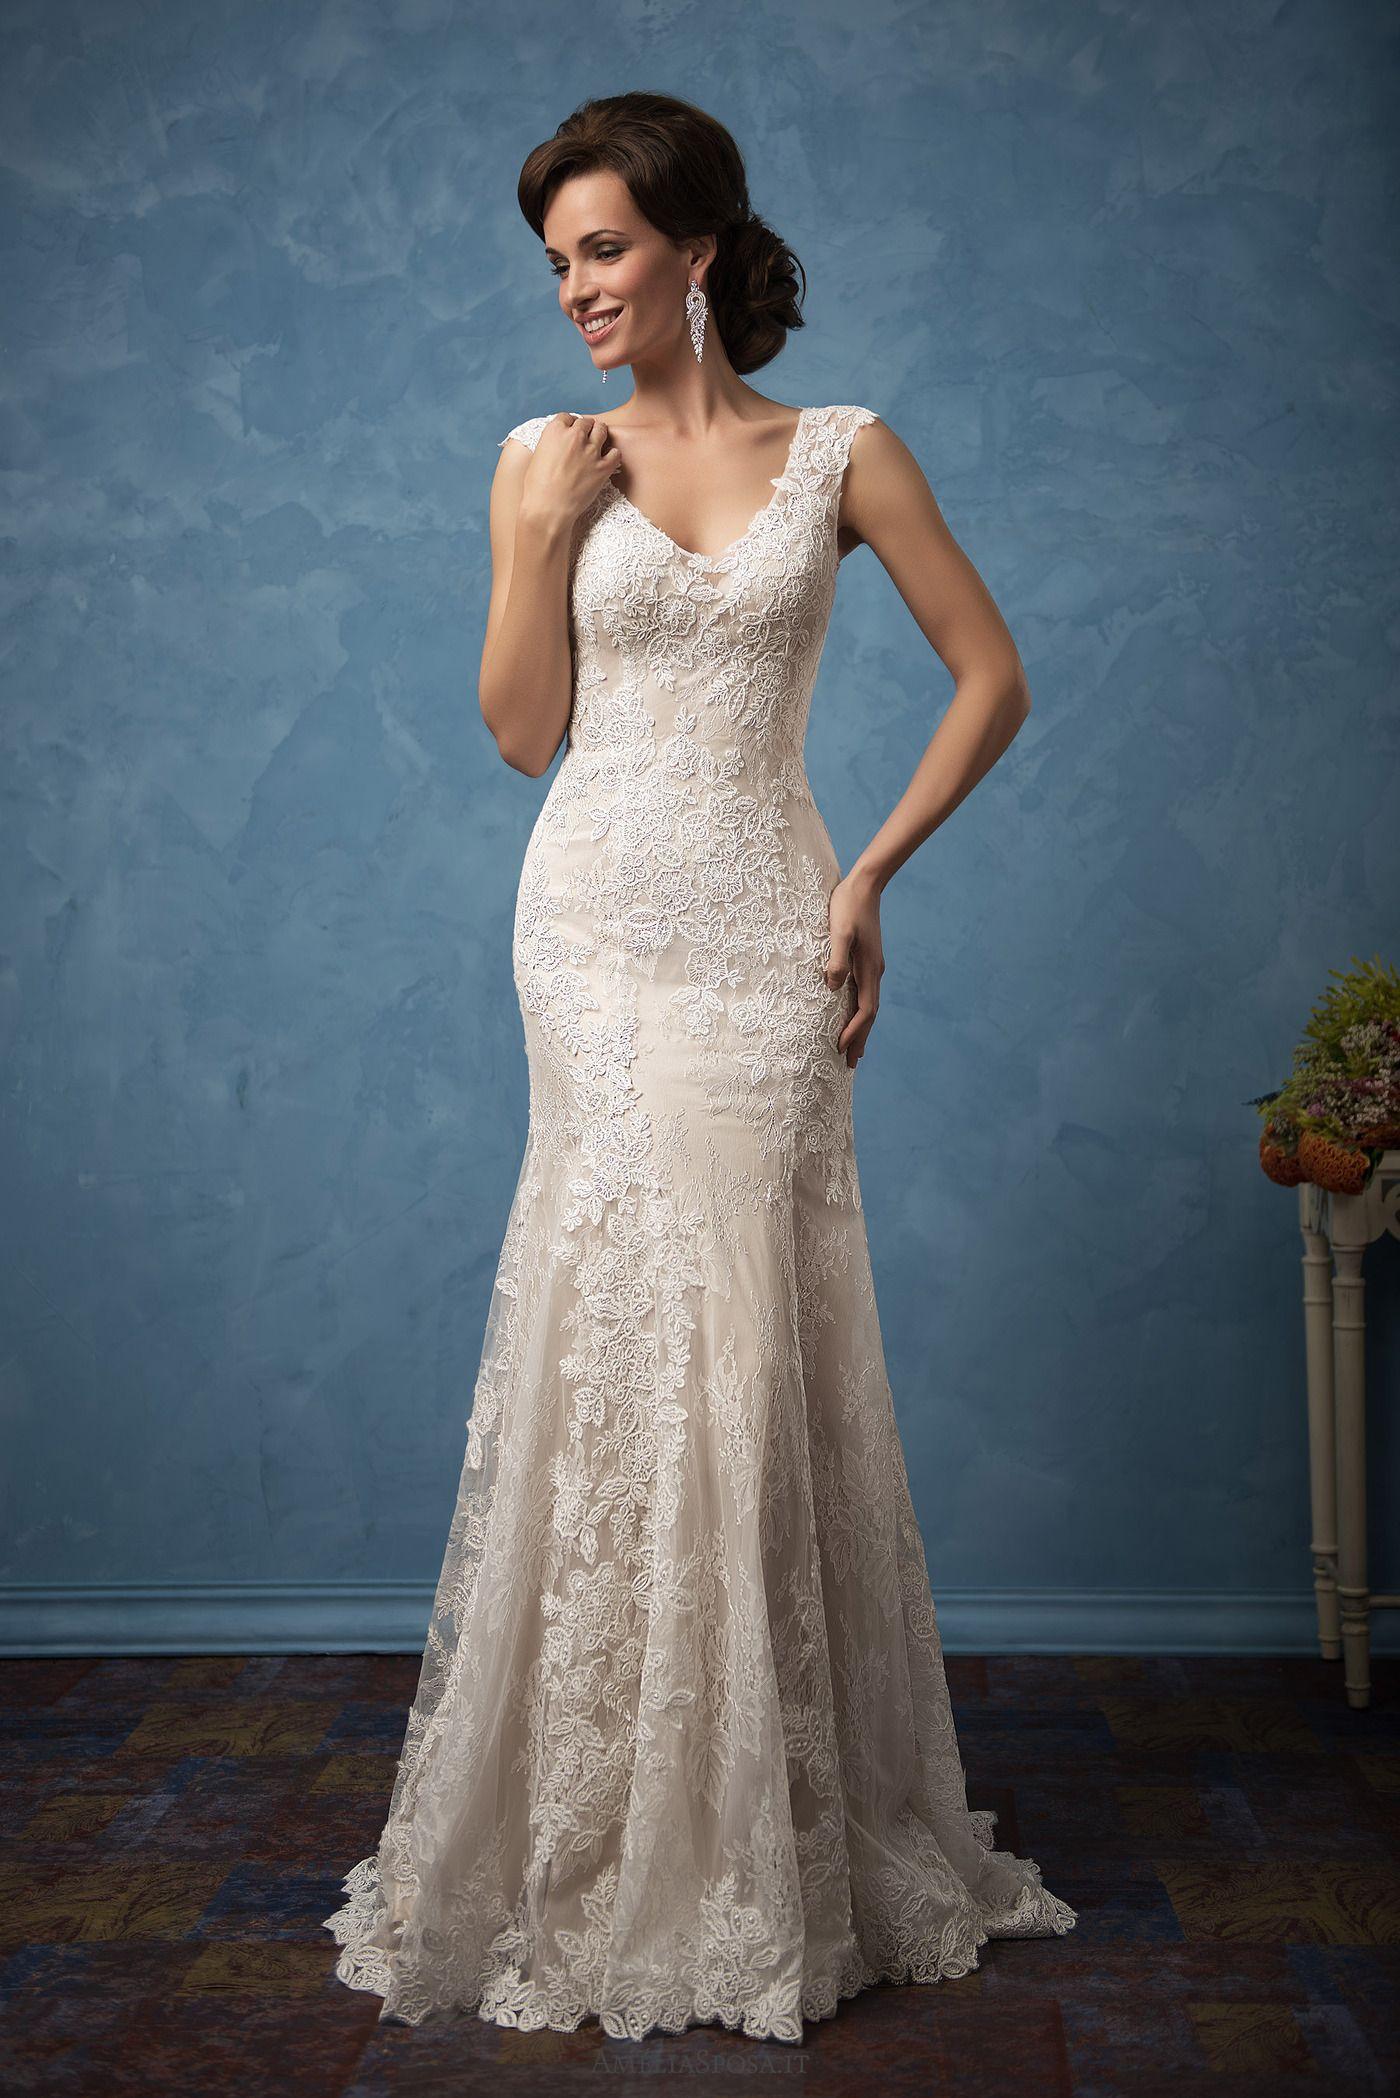 Wedding dress Adriana | For my girls future | Pinterest | Wedding ...